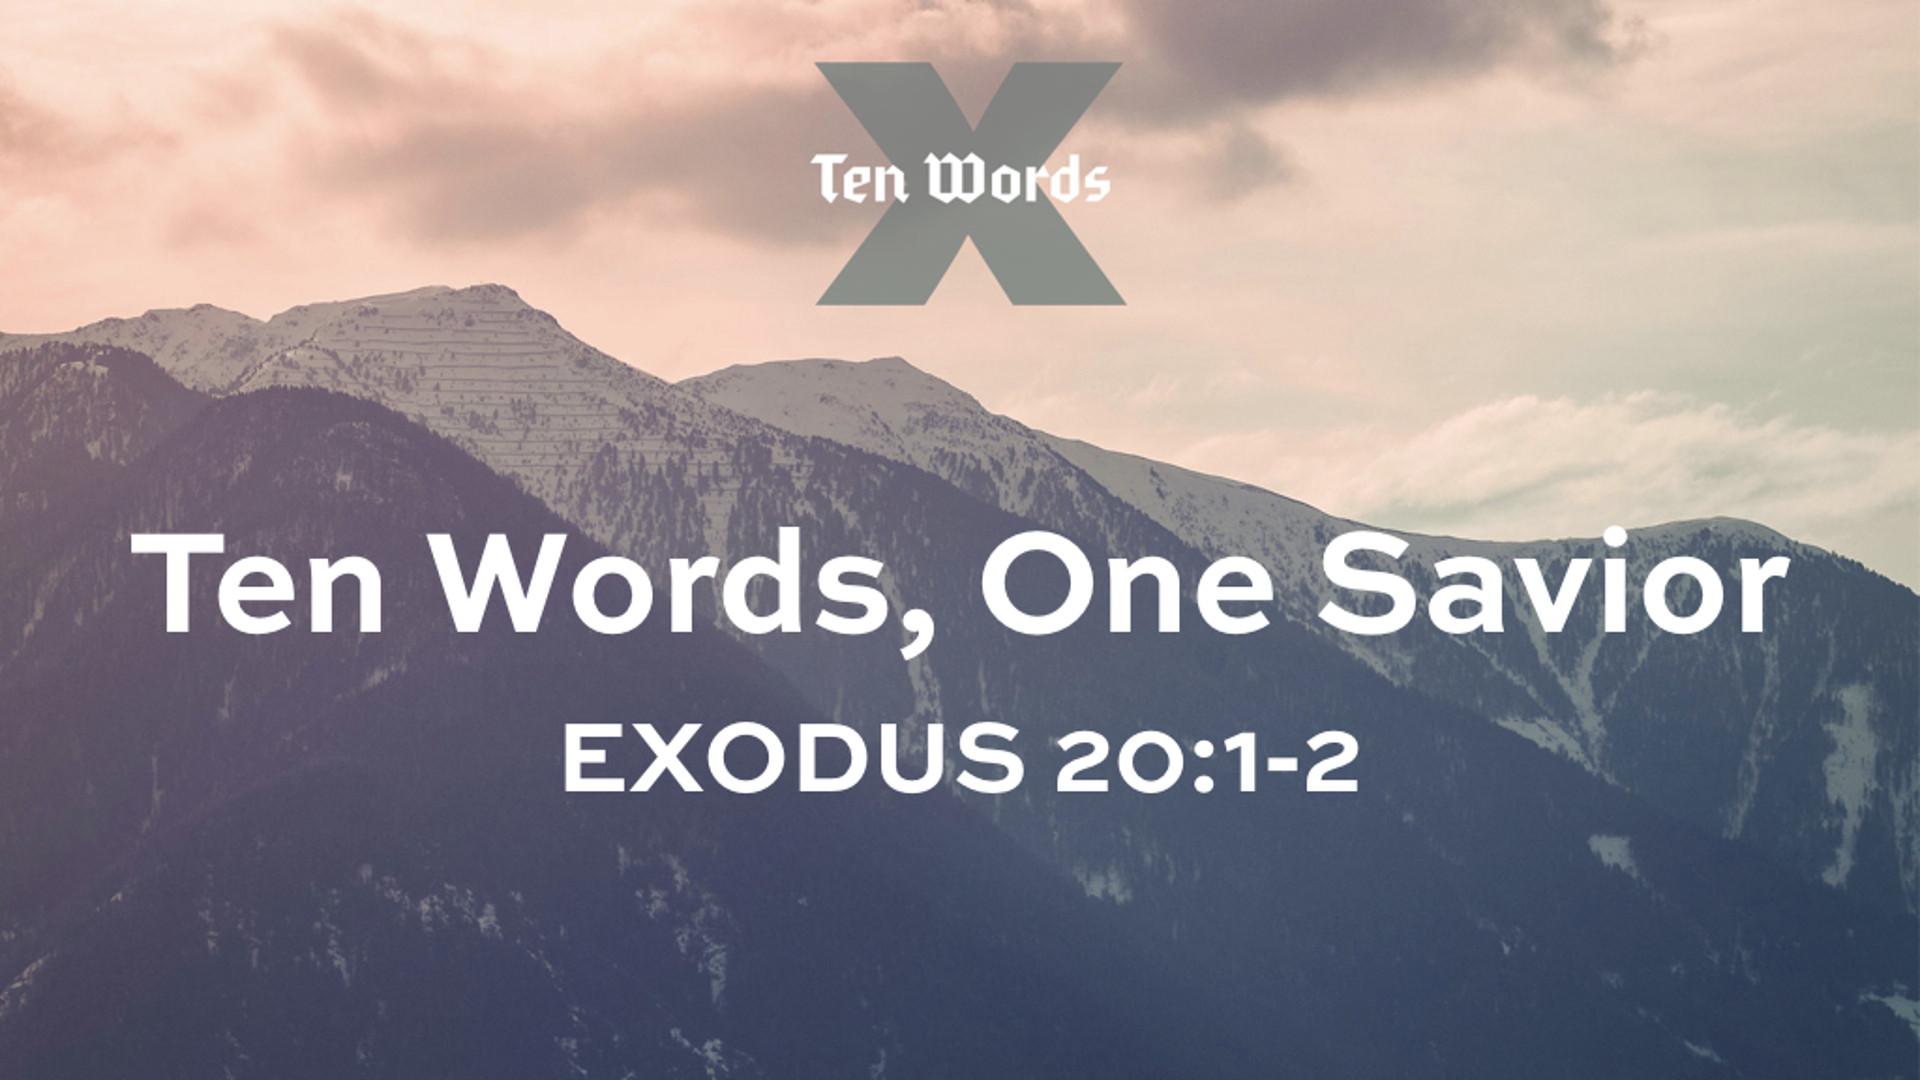 1 Ten Words One Savior - Ex 20.1-2.jpg